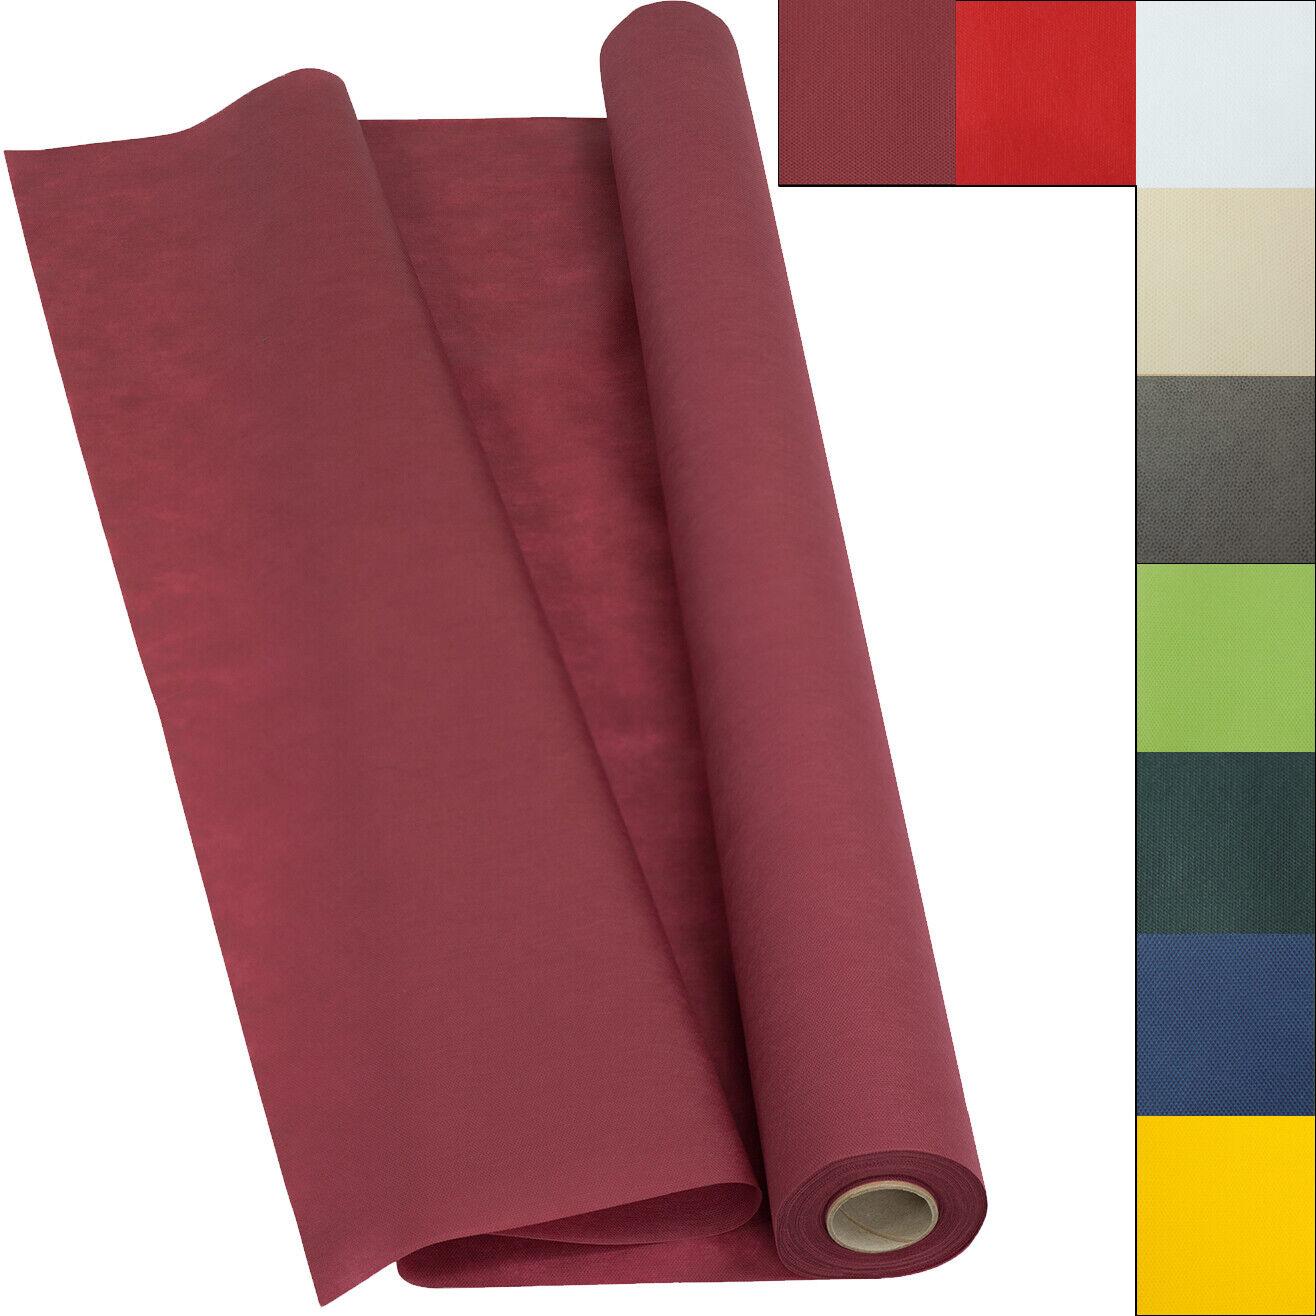 Sensalux light Tischdeckenrolle 25m lang, Vlies (Farbe nach Wahl) 1,10m x 25m